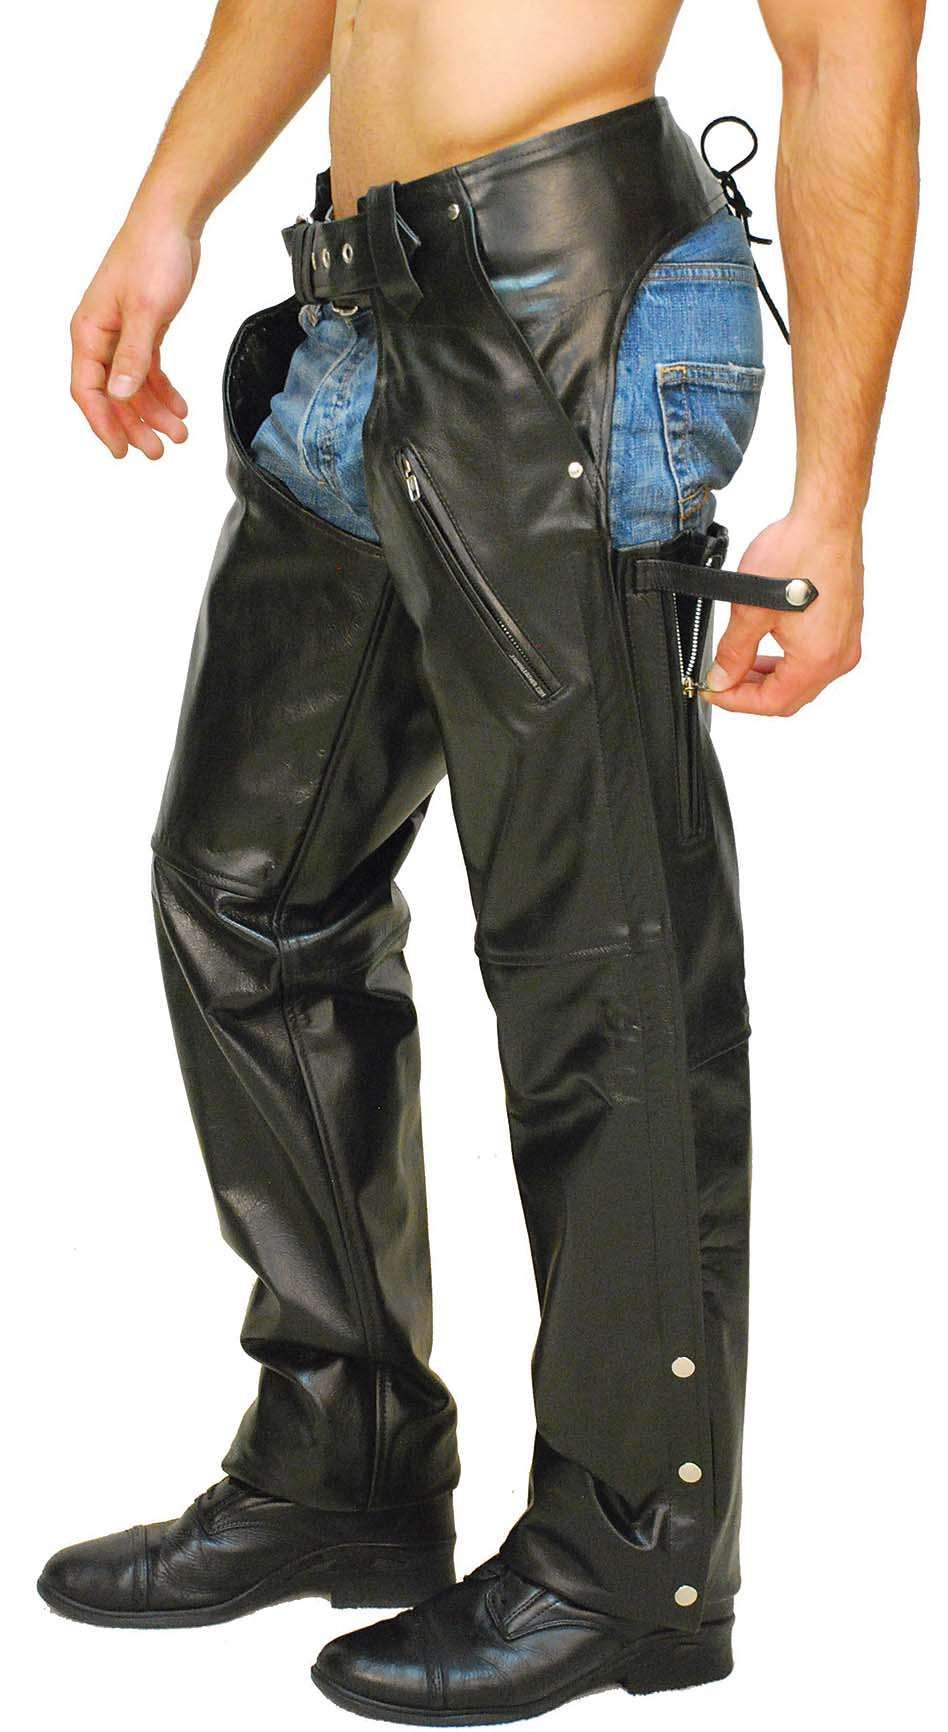 Premium Buffalo Pocket Chaps W Zip Thigh C2255zk Chaps Motorcycle Chaps Men